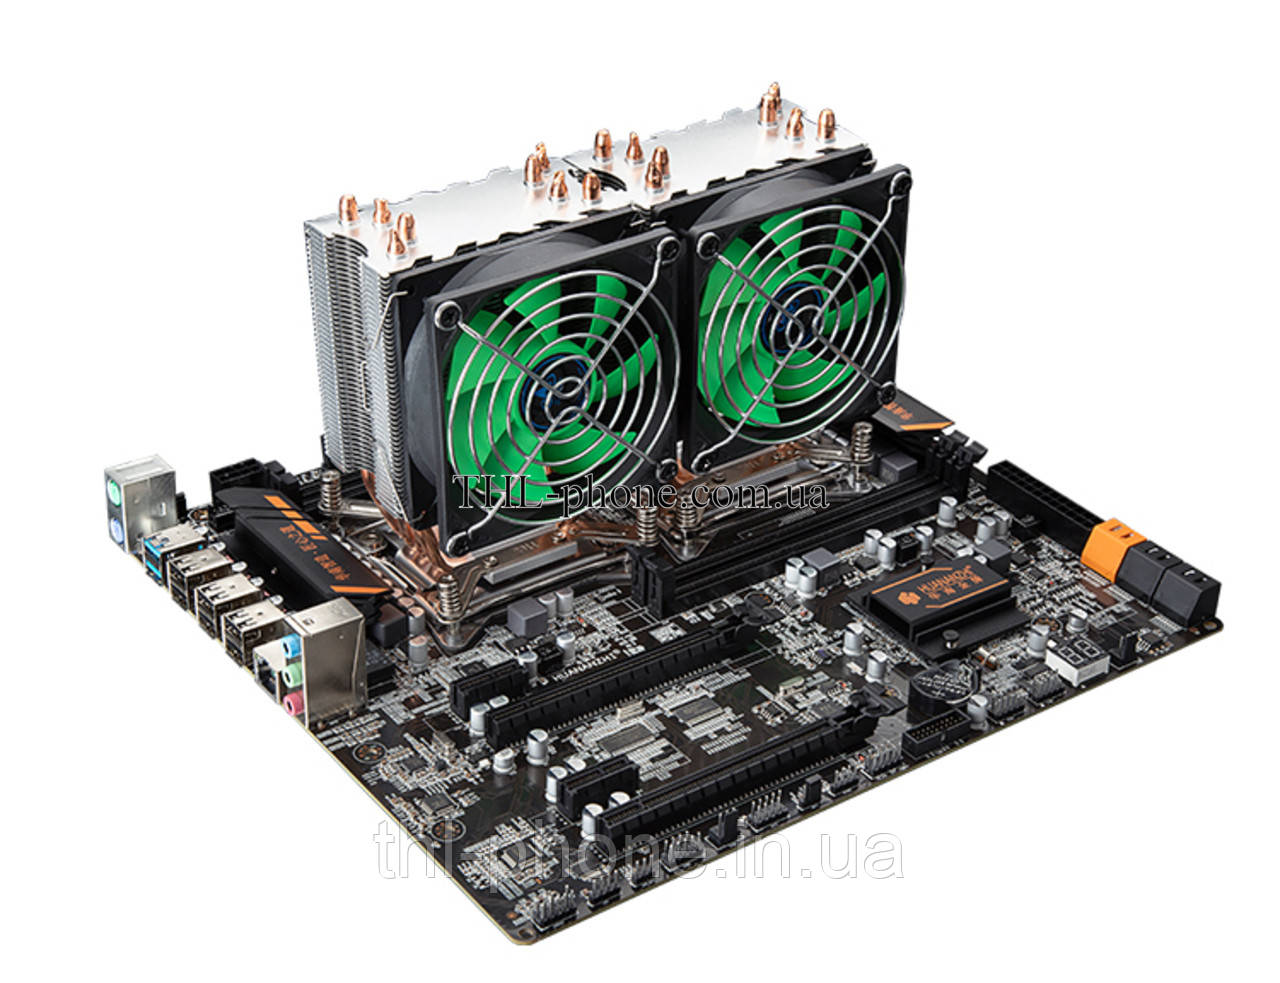 Комплект 2 Xeon e5 2680 V2, HUANANZHI X79 Dual Board Память 16/32/64 Гб 2 Кулер Lga 2011 Huanan